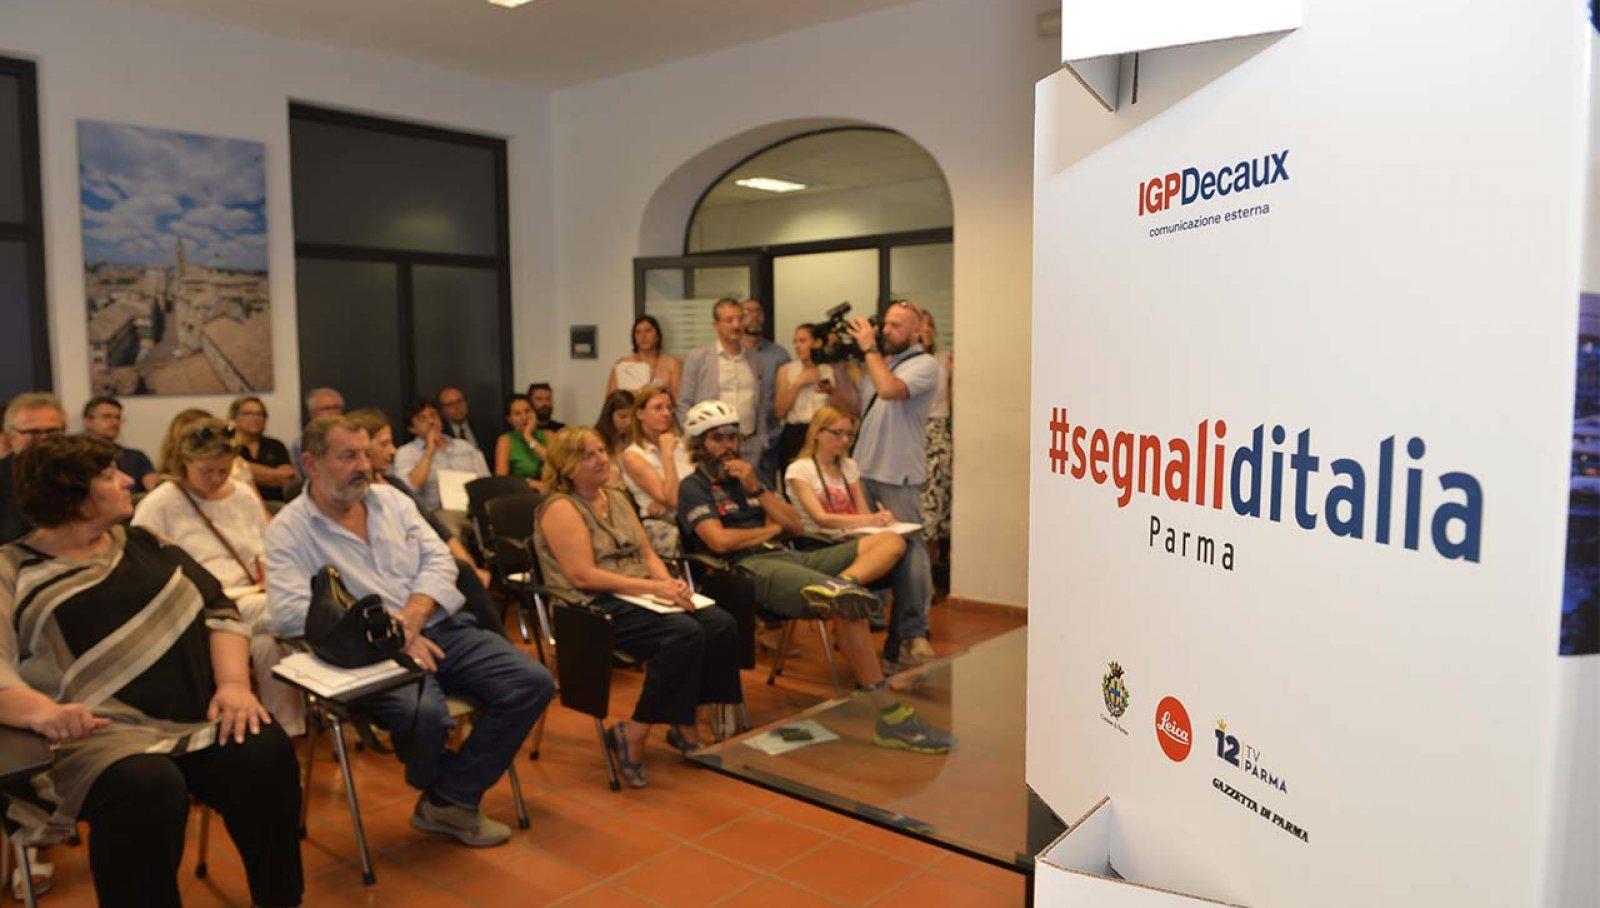 Campagna_Segnali_D'Italia_IGPDecaux2018